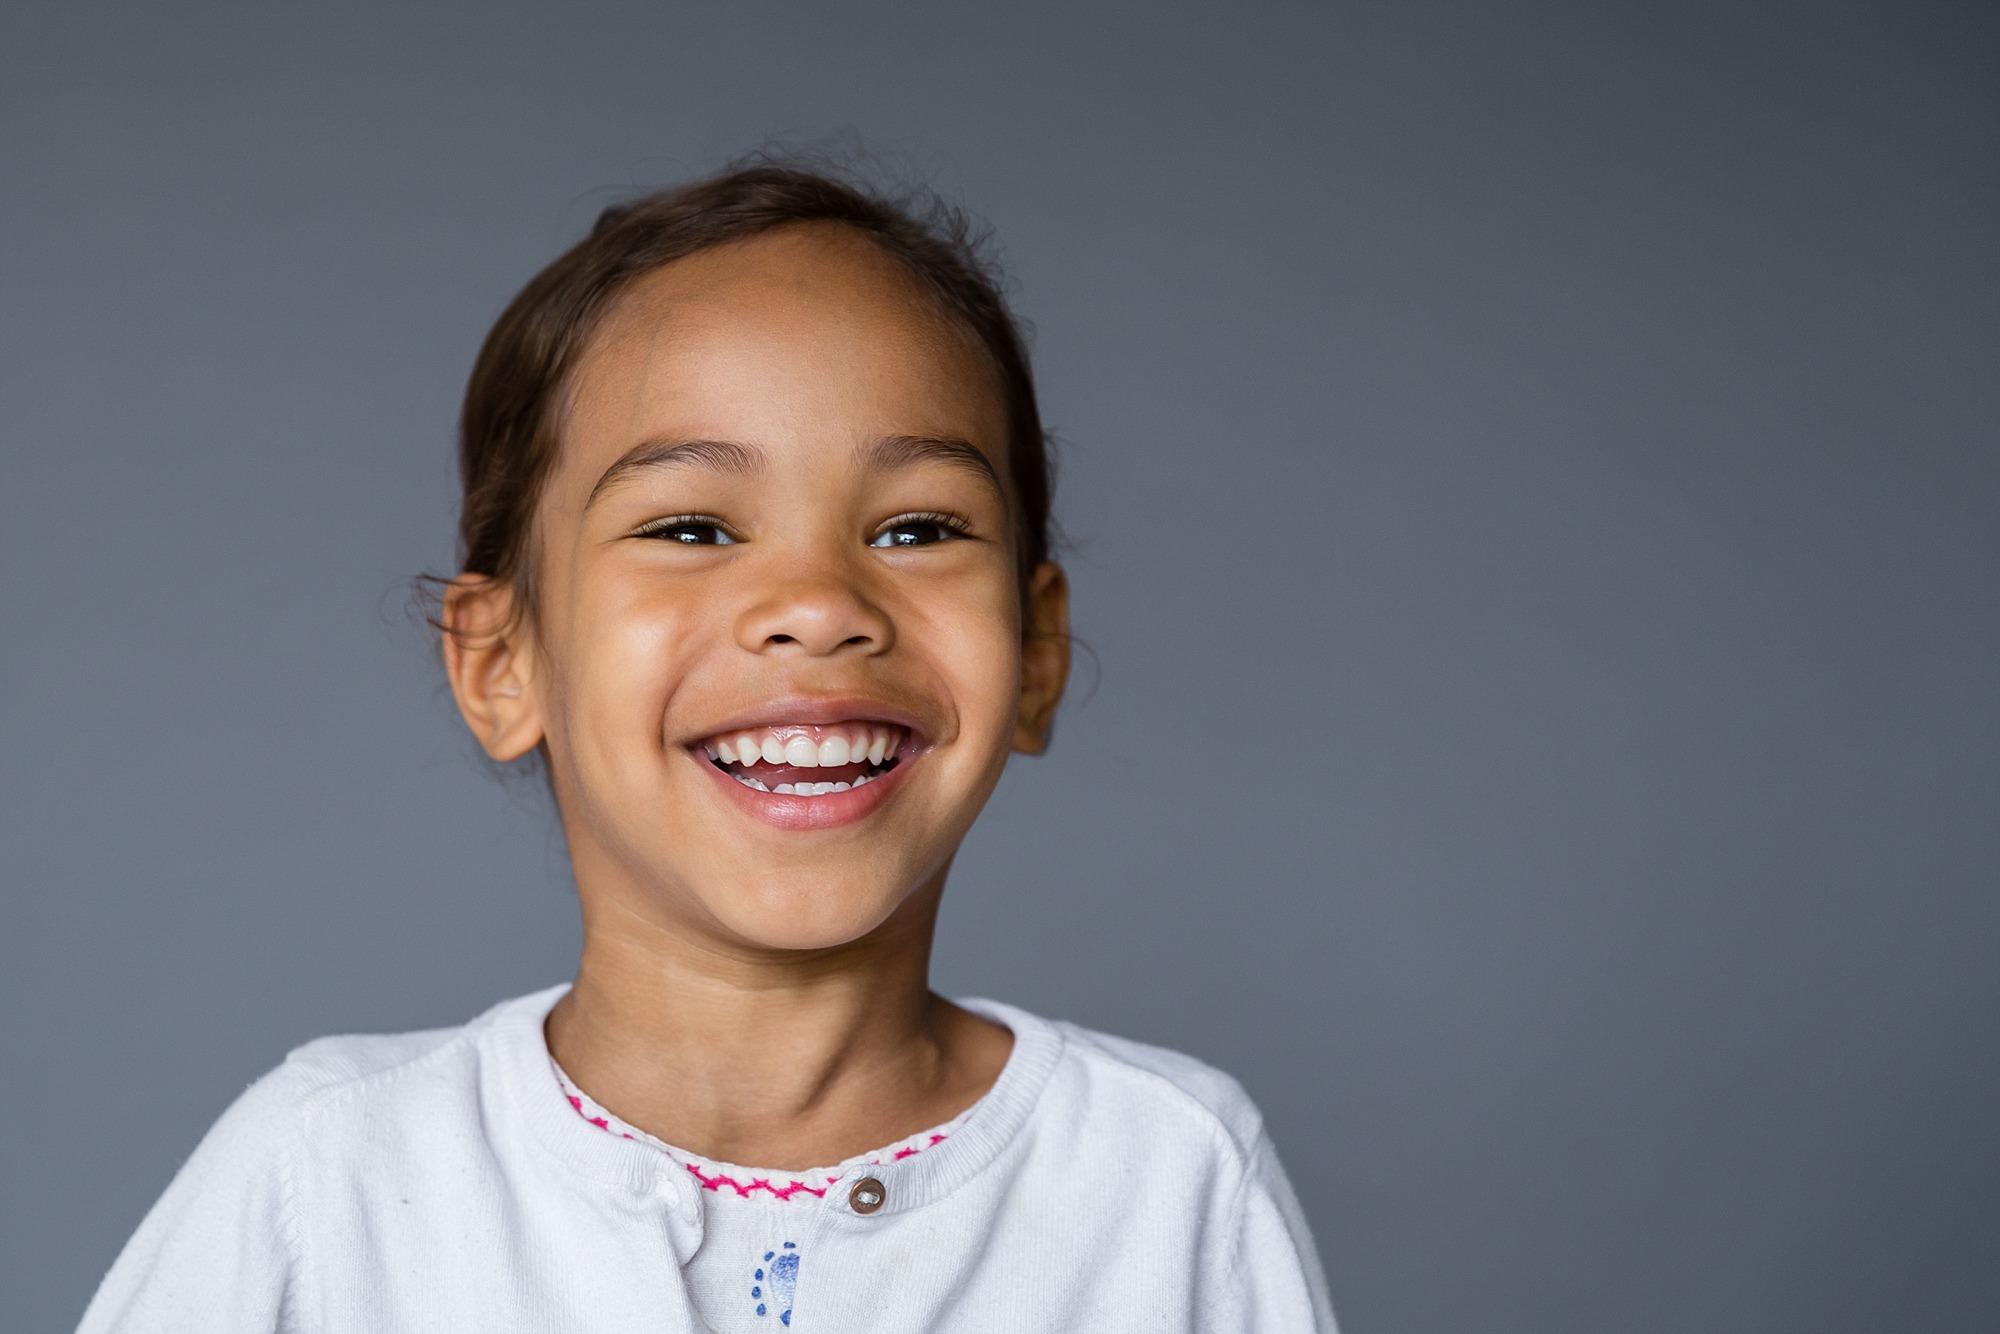 Modern_Childrens_Portraits_Hunnicutt_Photography_Collages_0003